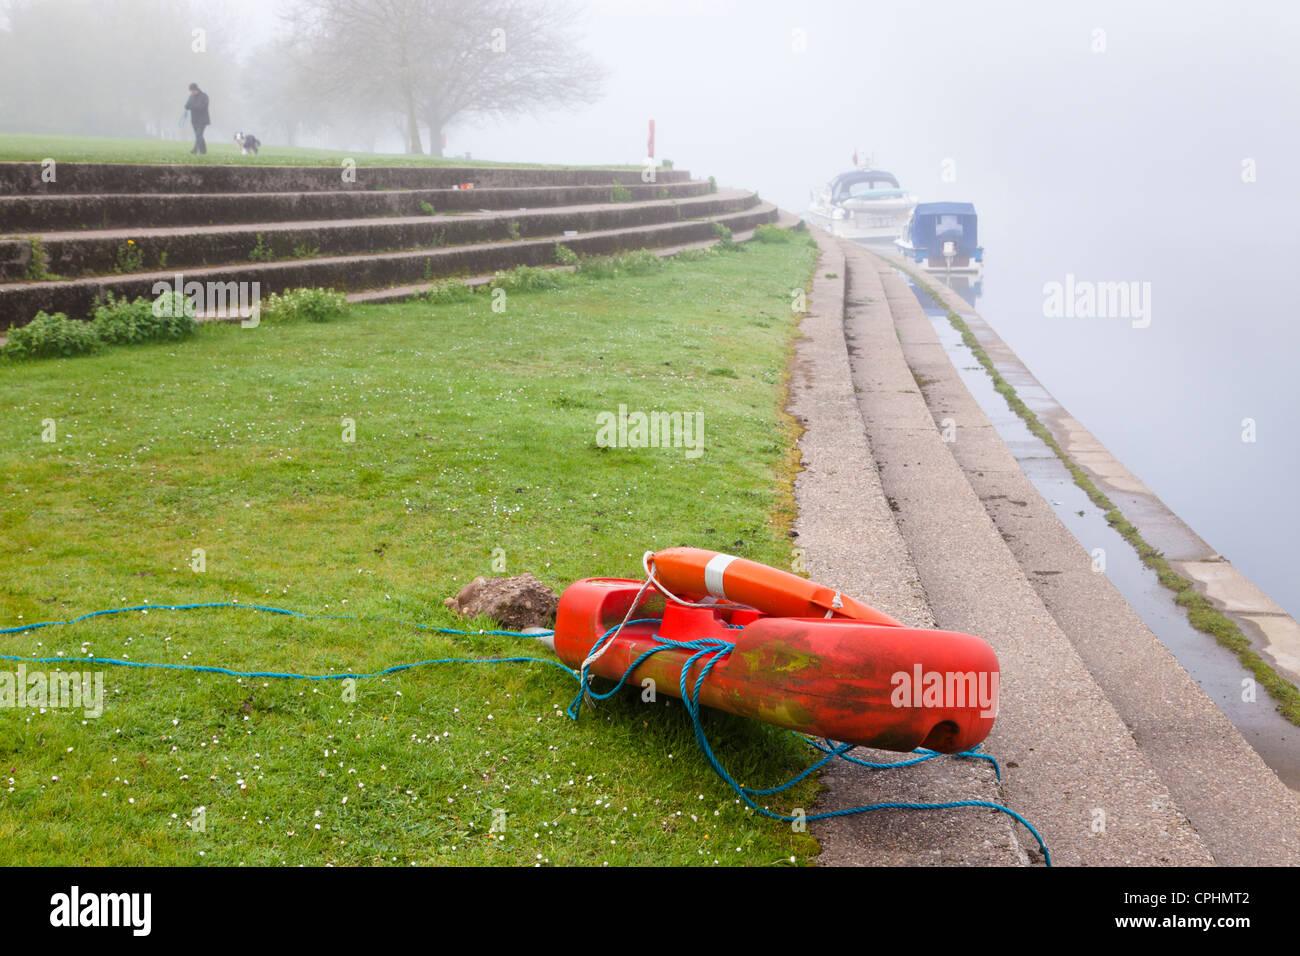 Vandalism of safety equipment. A vandalised lifebuoy by the River Trent, Nottinghamshire, England, UK - Stock Image